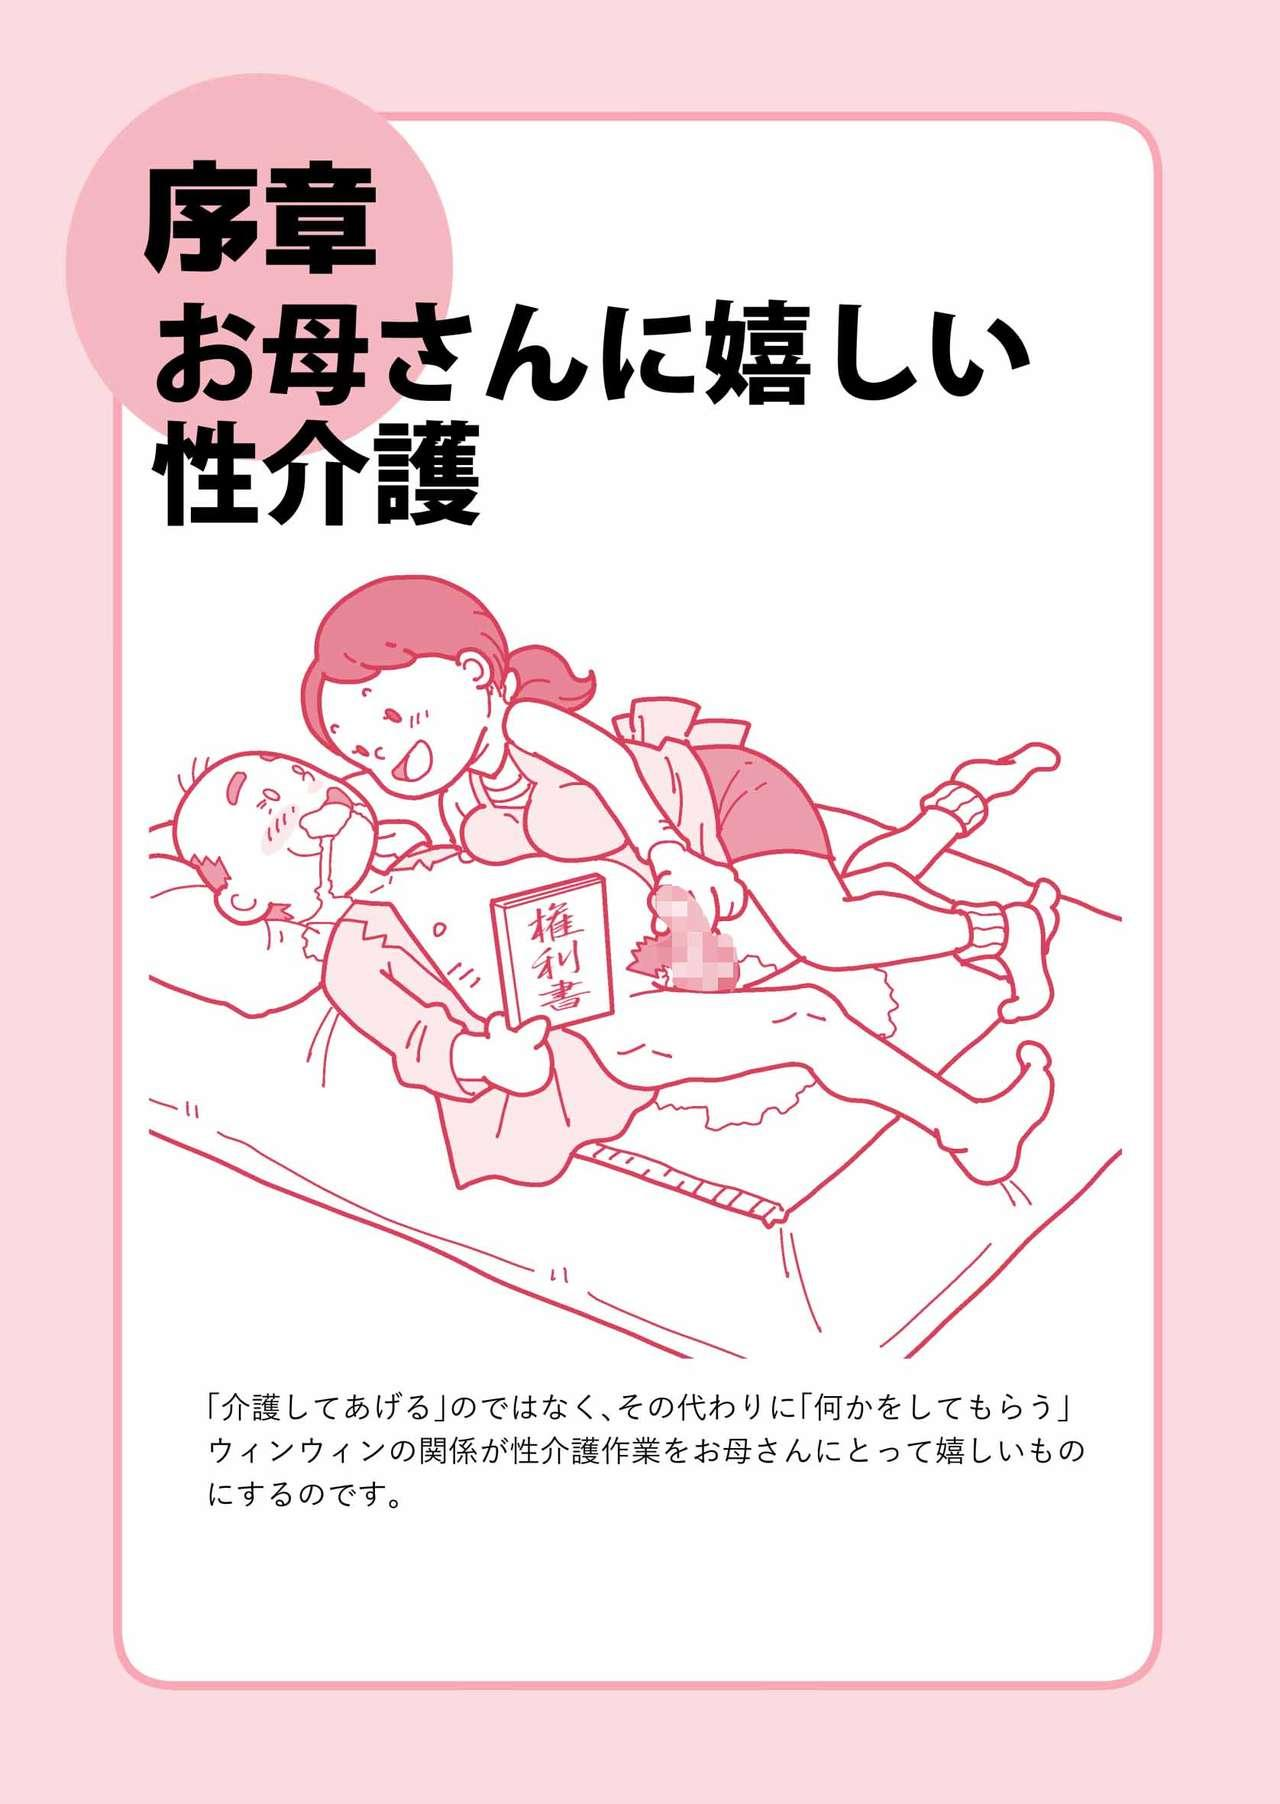 Isogasii Okaasan No Tamuno Sasa Rouzin Seikaigo | Guide for Elderly Sex Health Care to Busy Mom 8